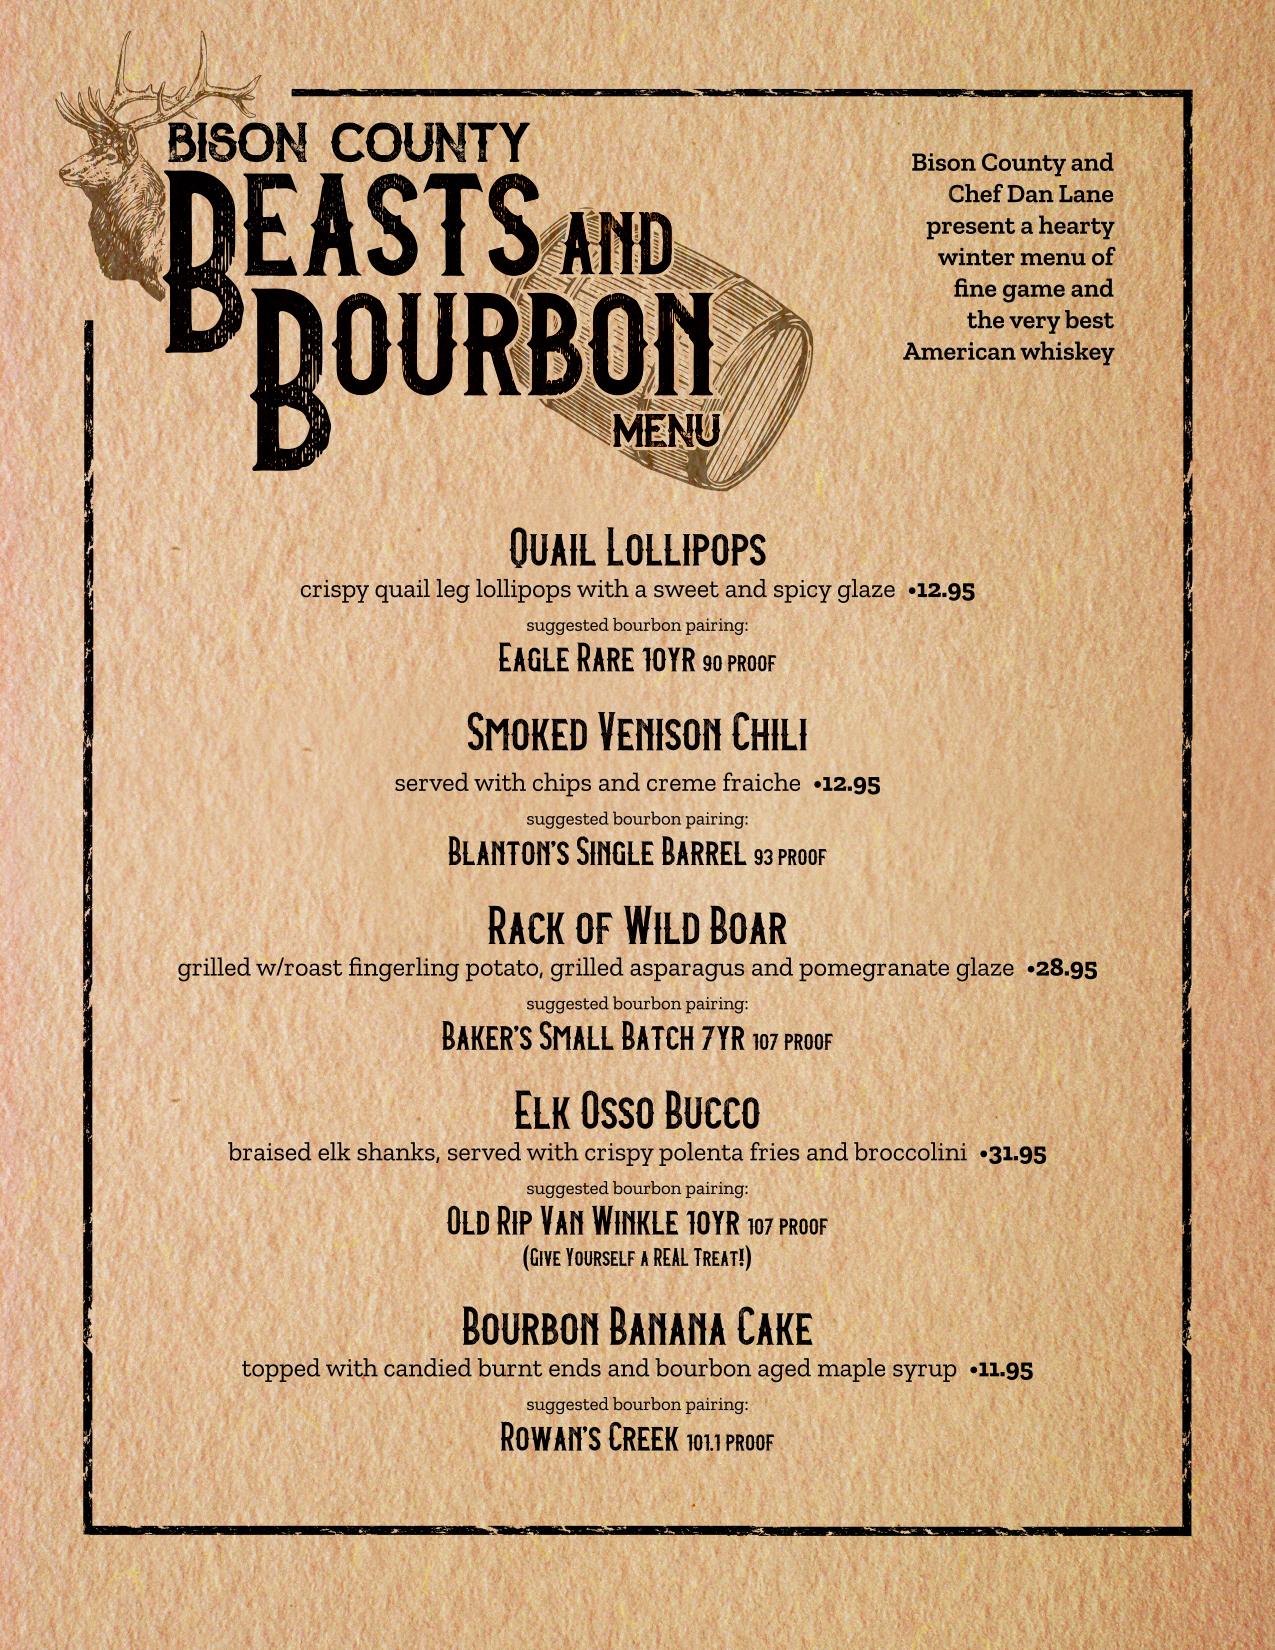 b&B menu.jpg